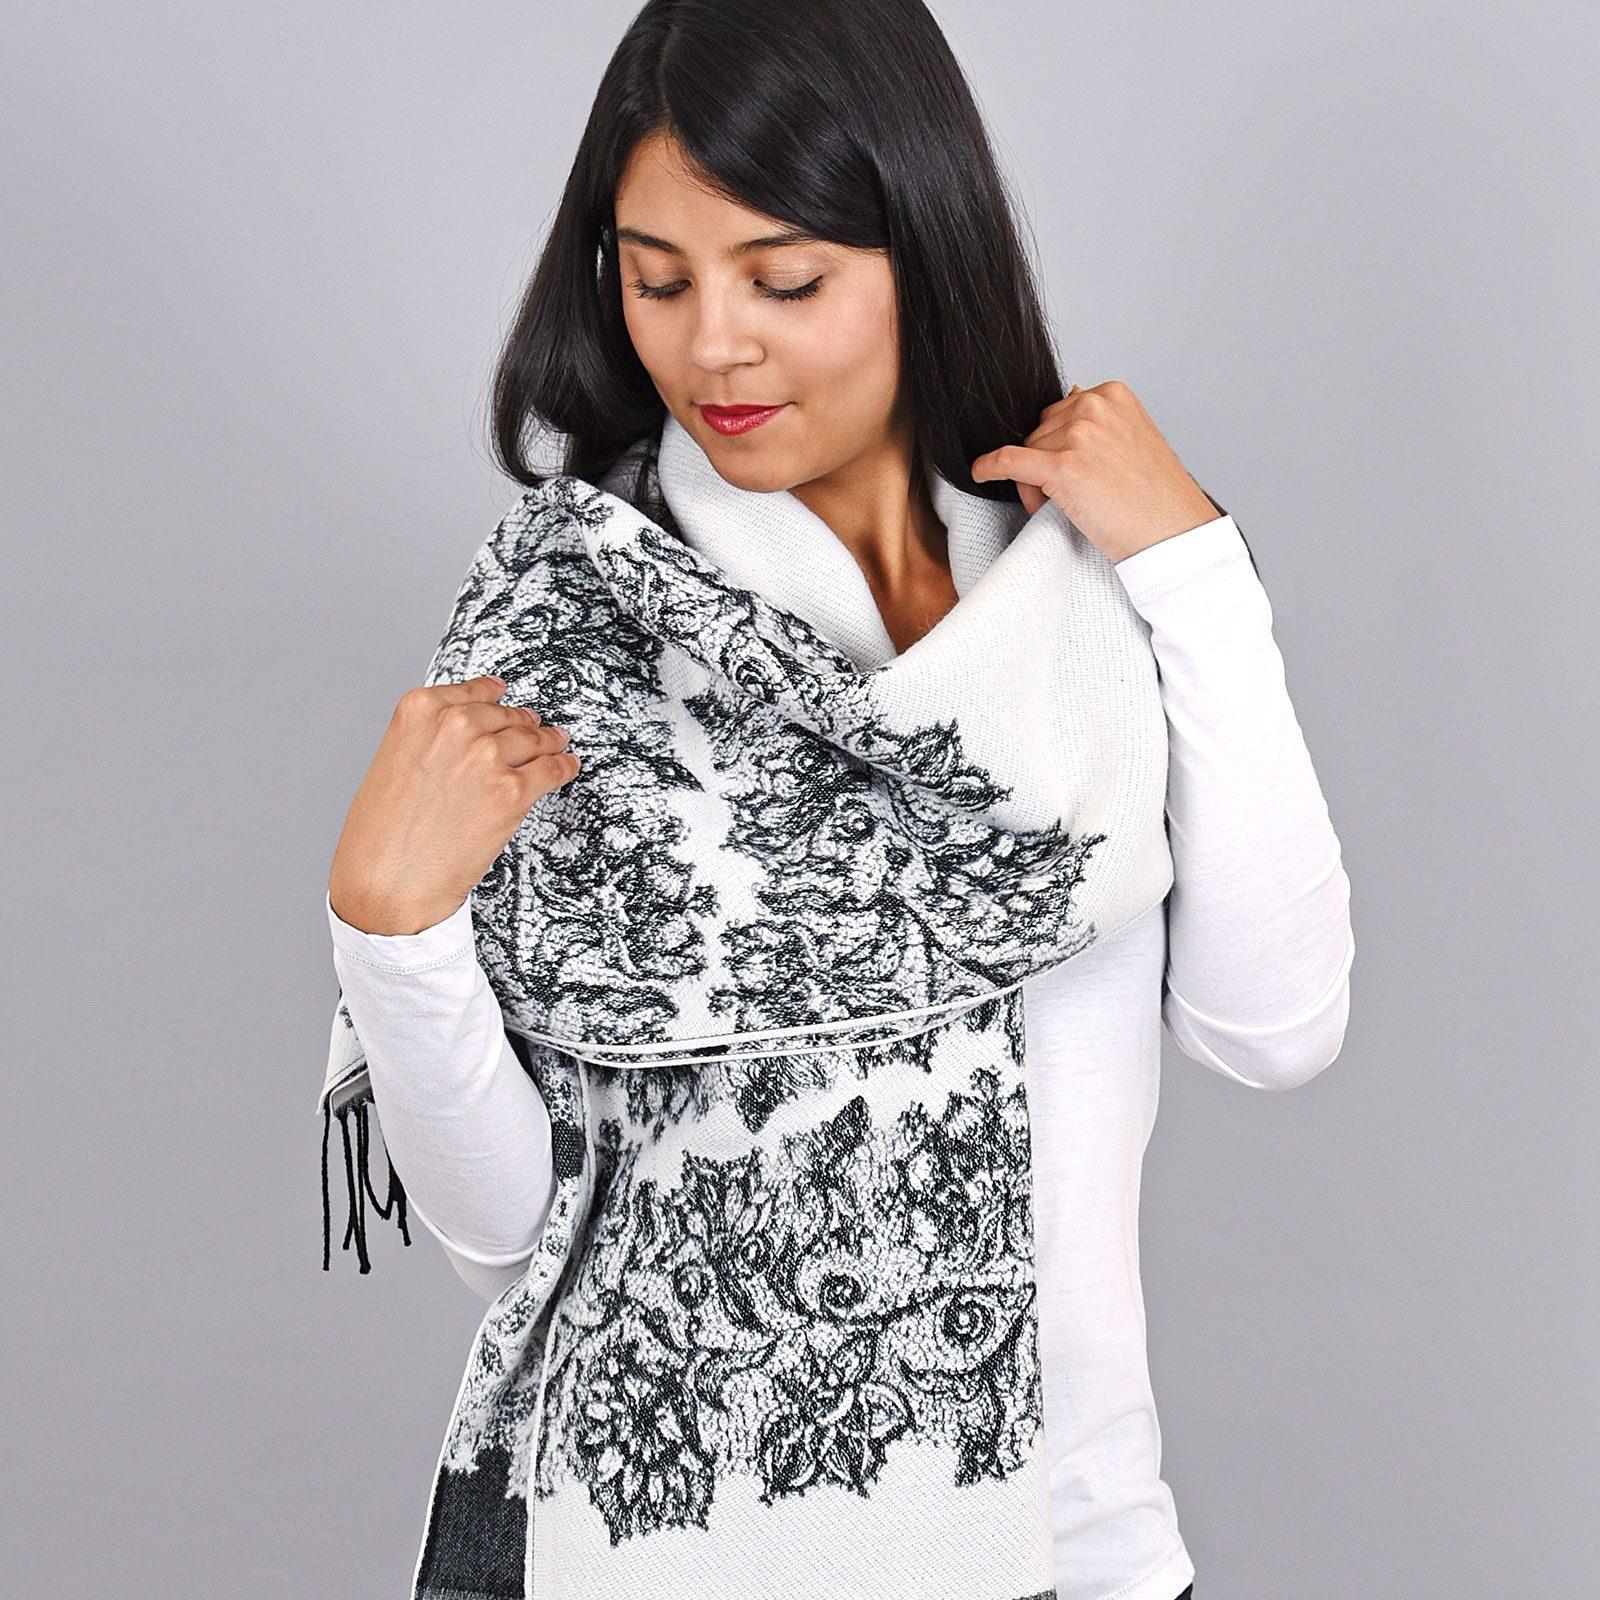 http://lookbook.allee-du-foulard.fr/wp-content/uploads/2018/11/AT-03954-VF16-1-chale-blanc-fleurs-1600x1600.jpg